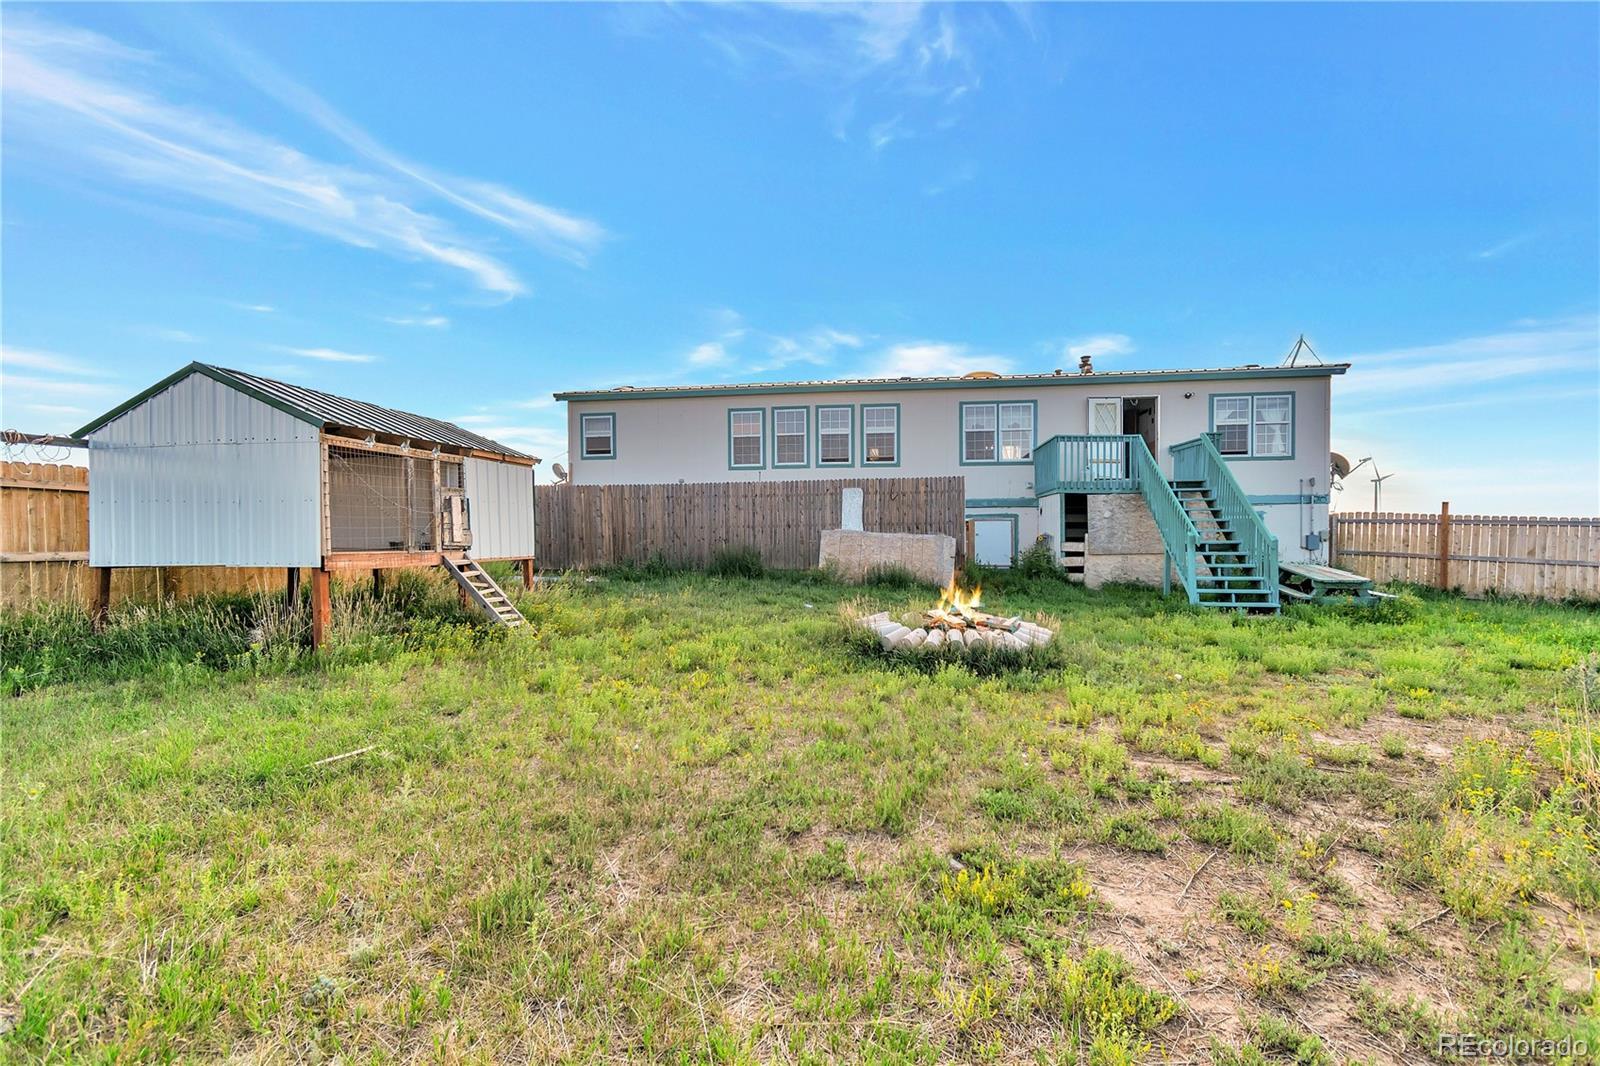 10420 Hahn Road, Calhan, CO 80808 - Calhan, CO real estate listing